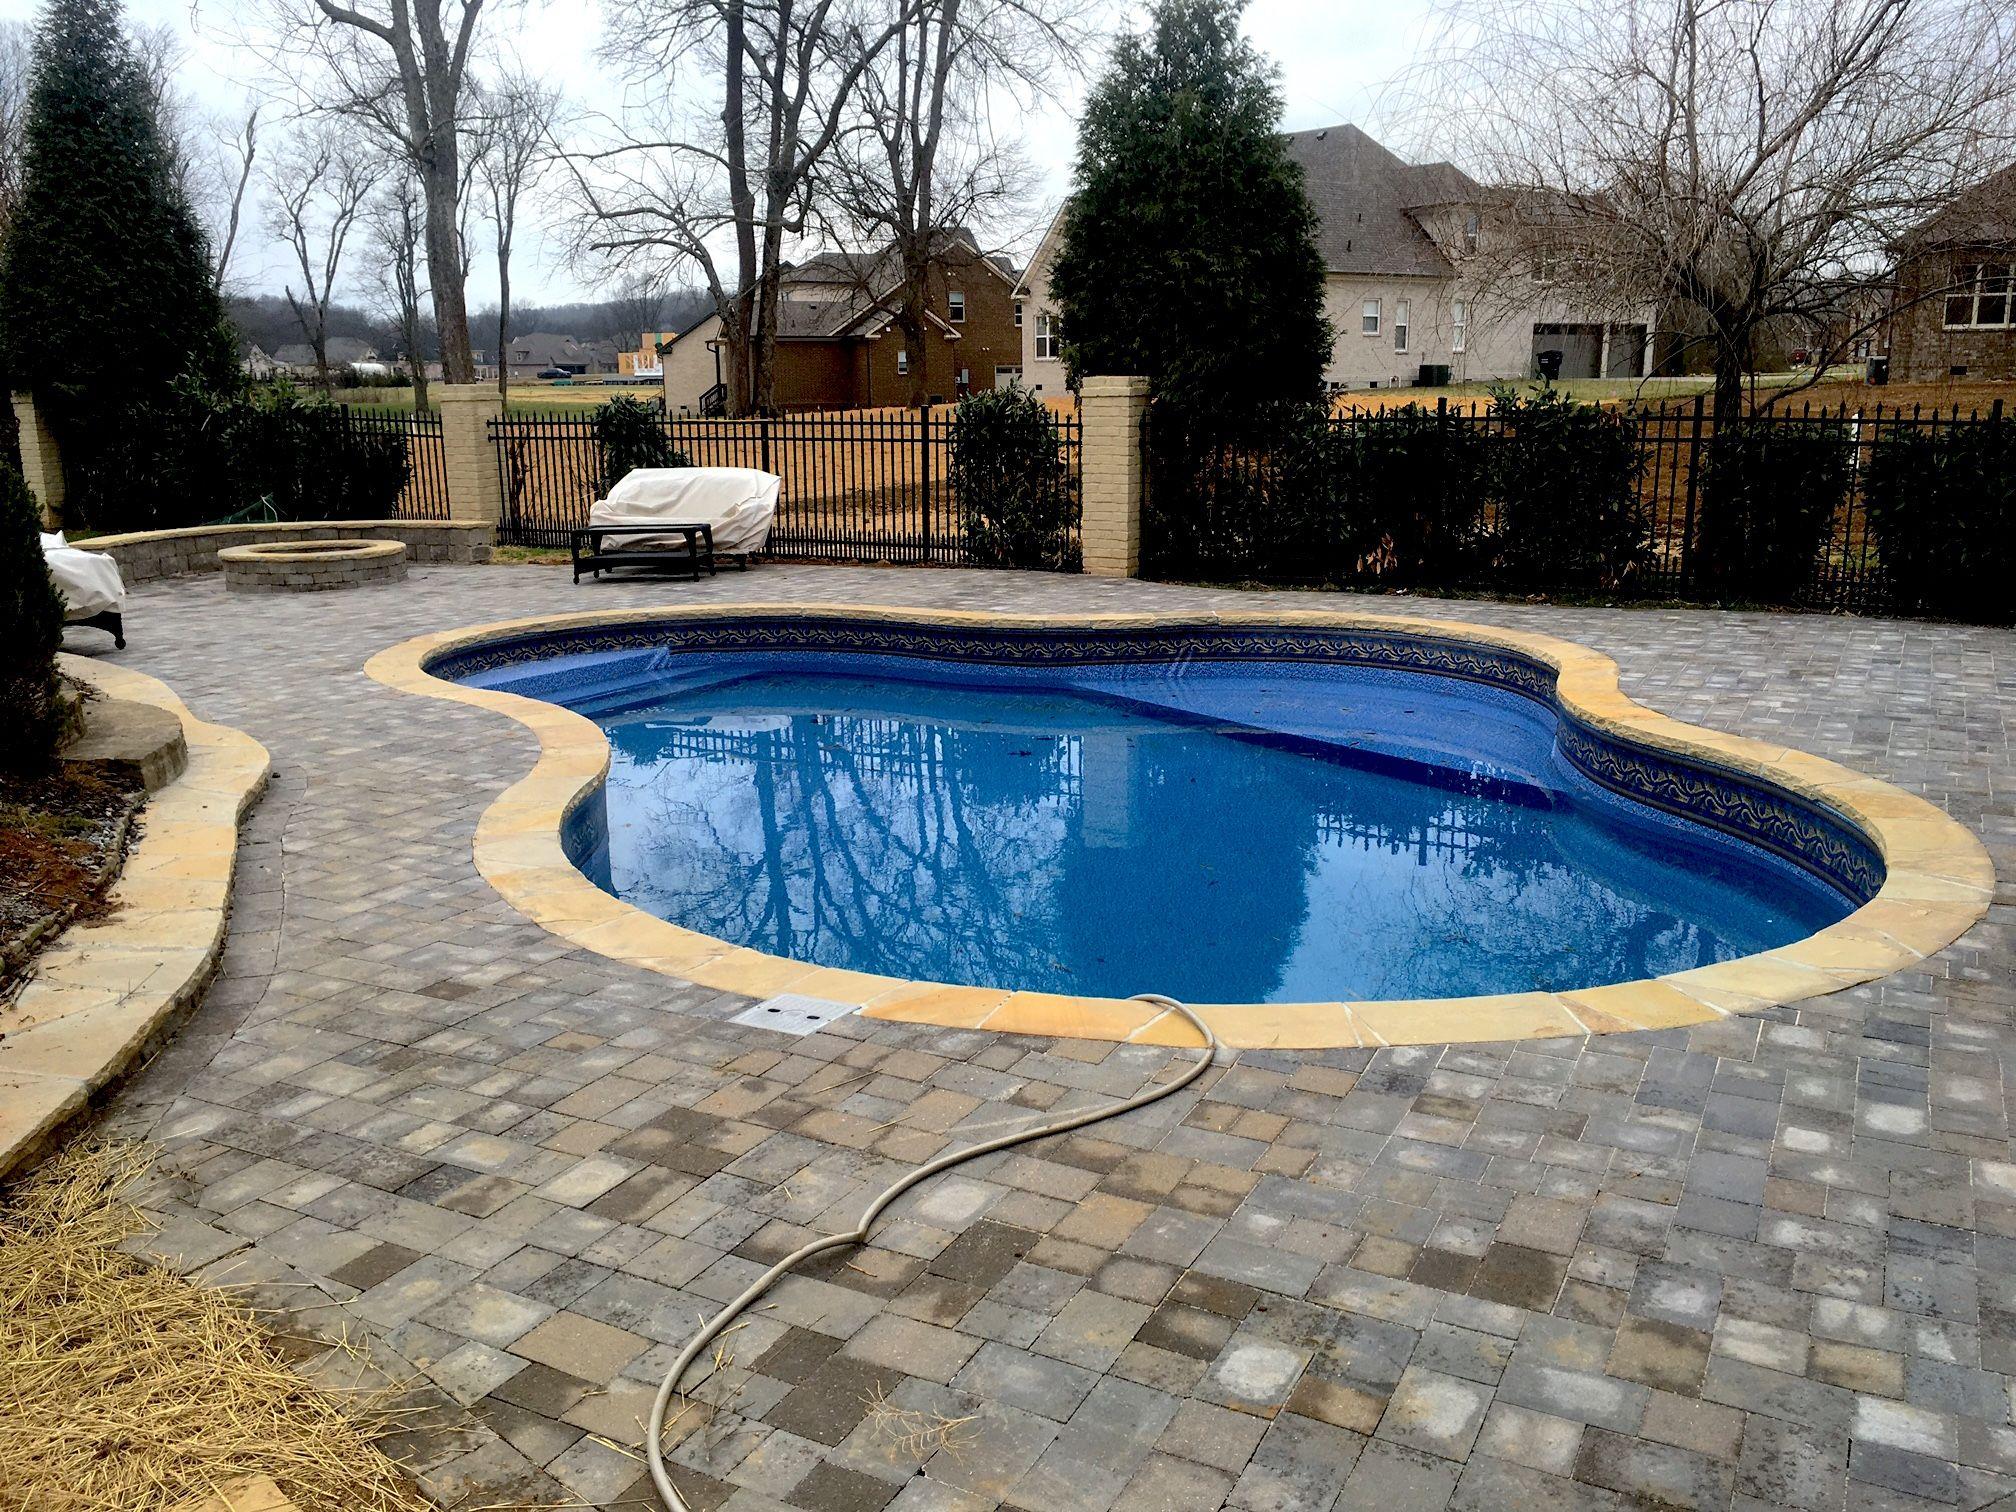 Pool And Spa Depot 20 X 30 Concrete Wall Pool Celaya Shape Princeton Gemstone Liner Pattern Beige Flagstone Coping Paver Decki Spa Pool Pool Concrete Wall